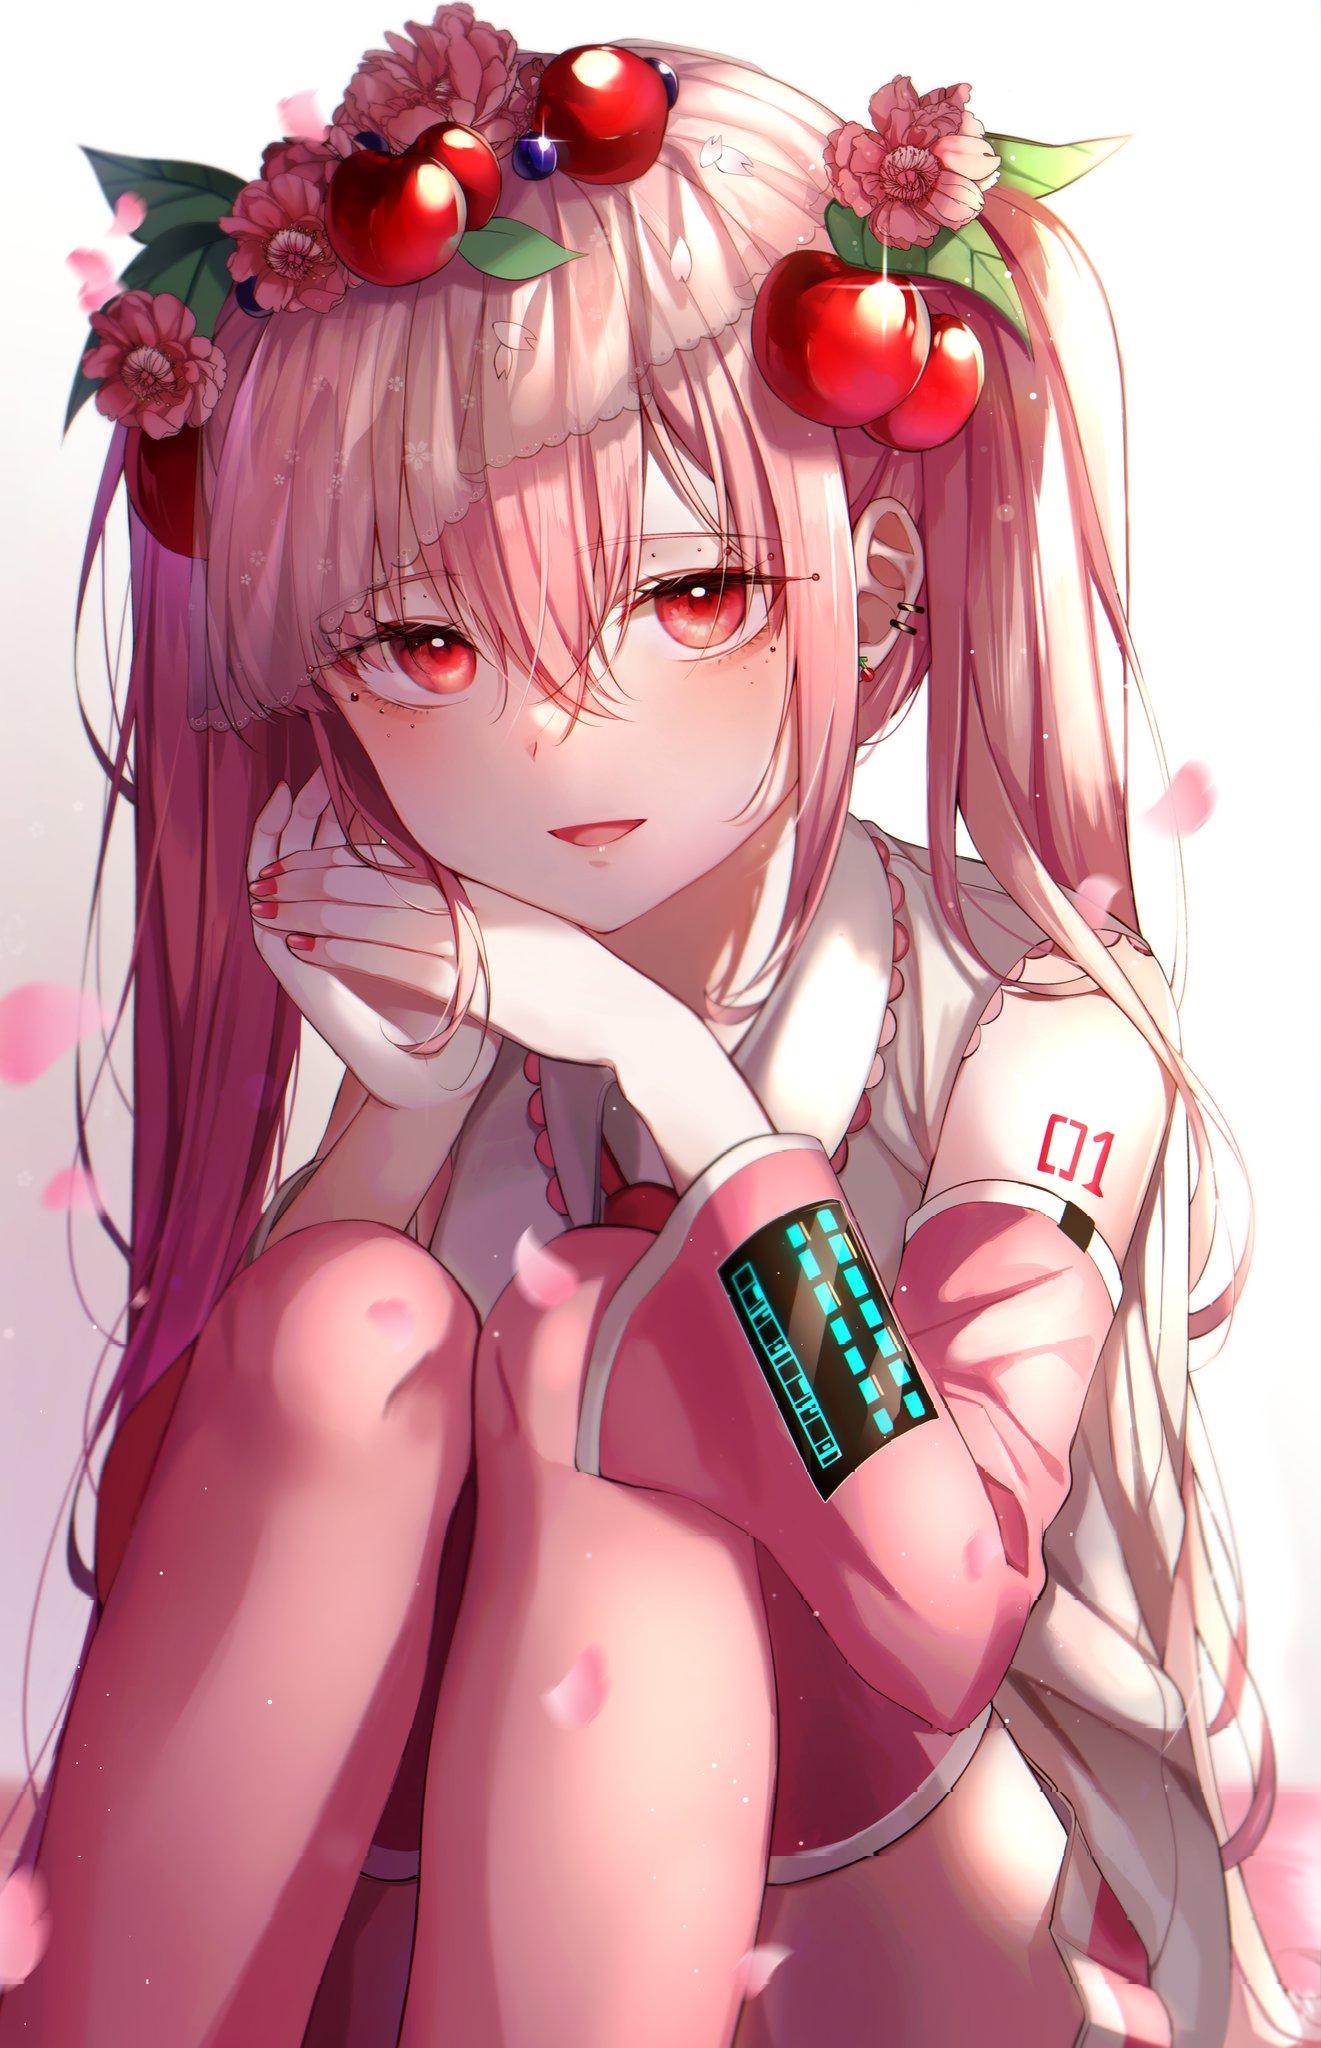 Sakura Miku [Vocaloid] 🍒